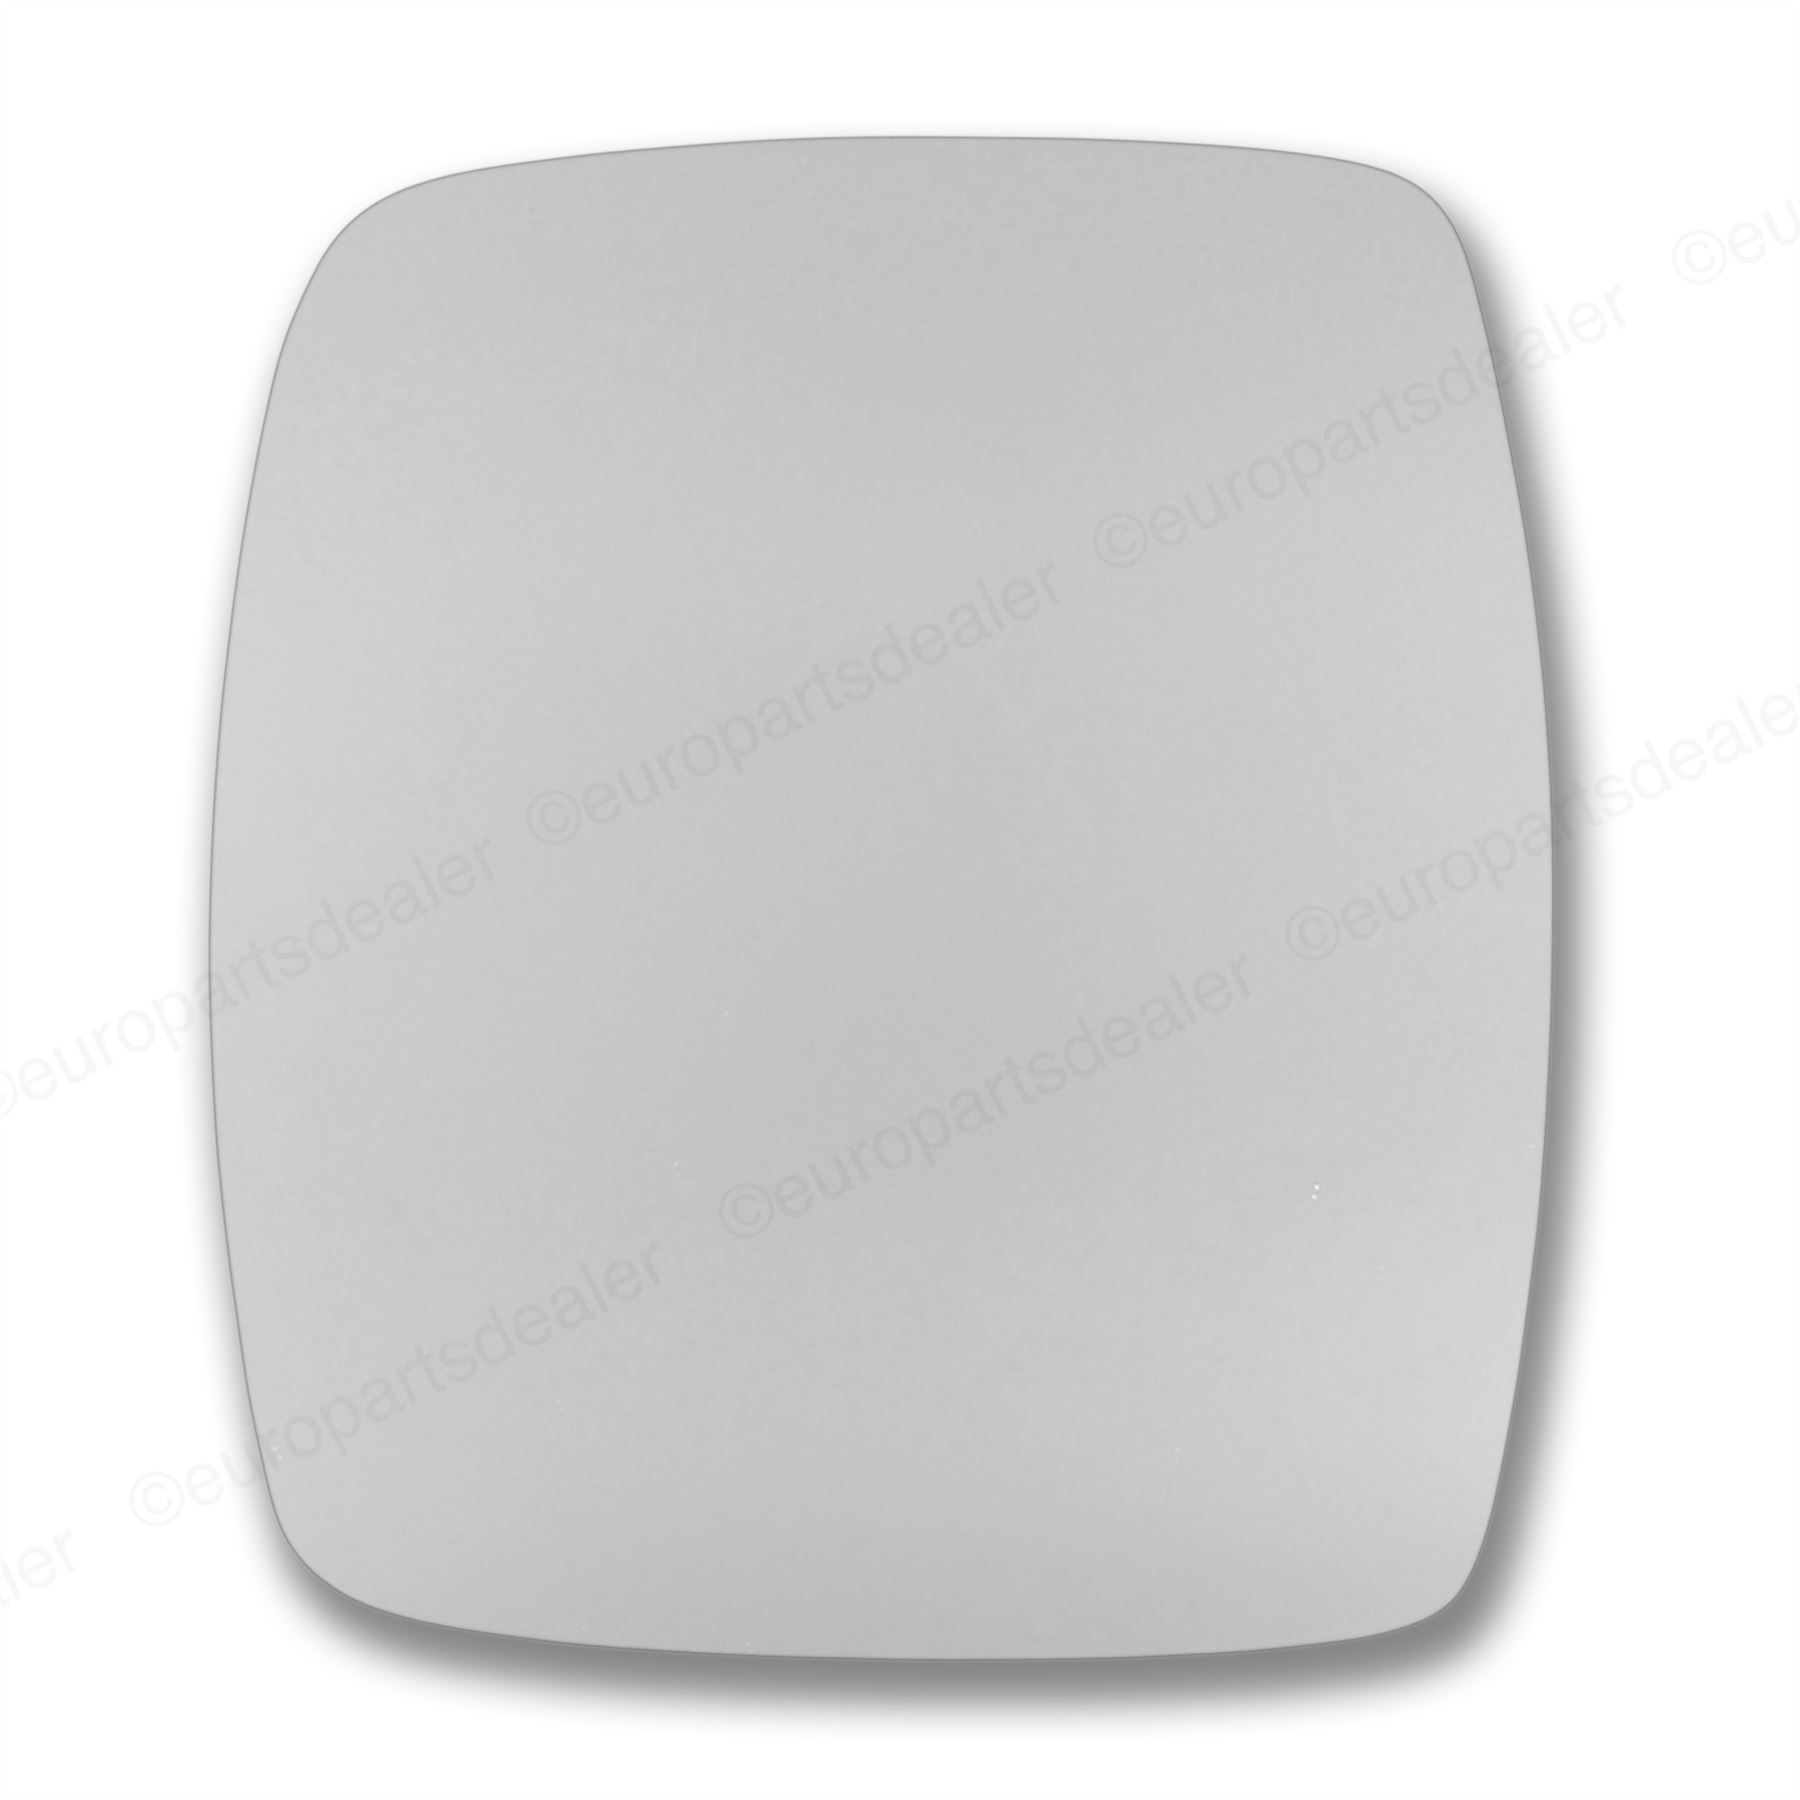 plate Left Passenger side Wing door mirror glass for Citroen C5 2008-16